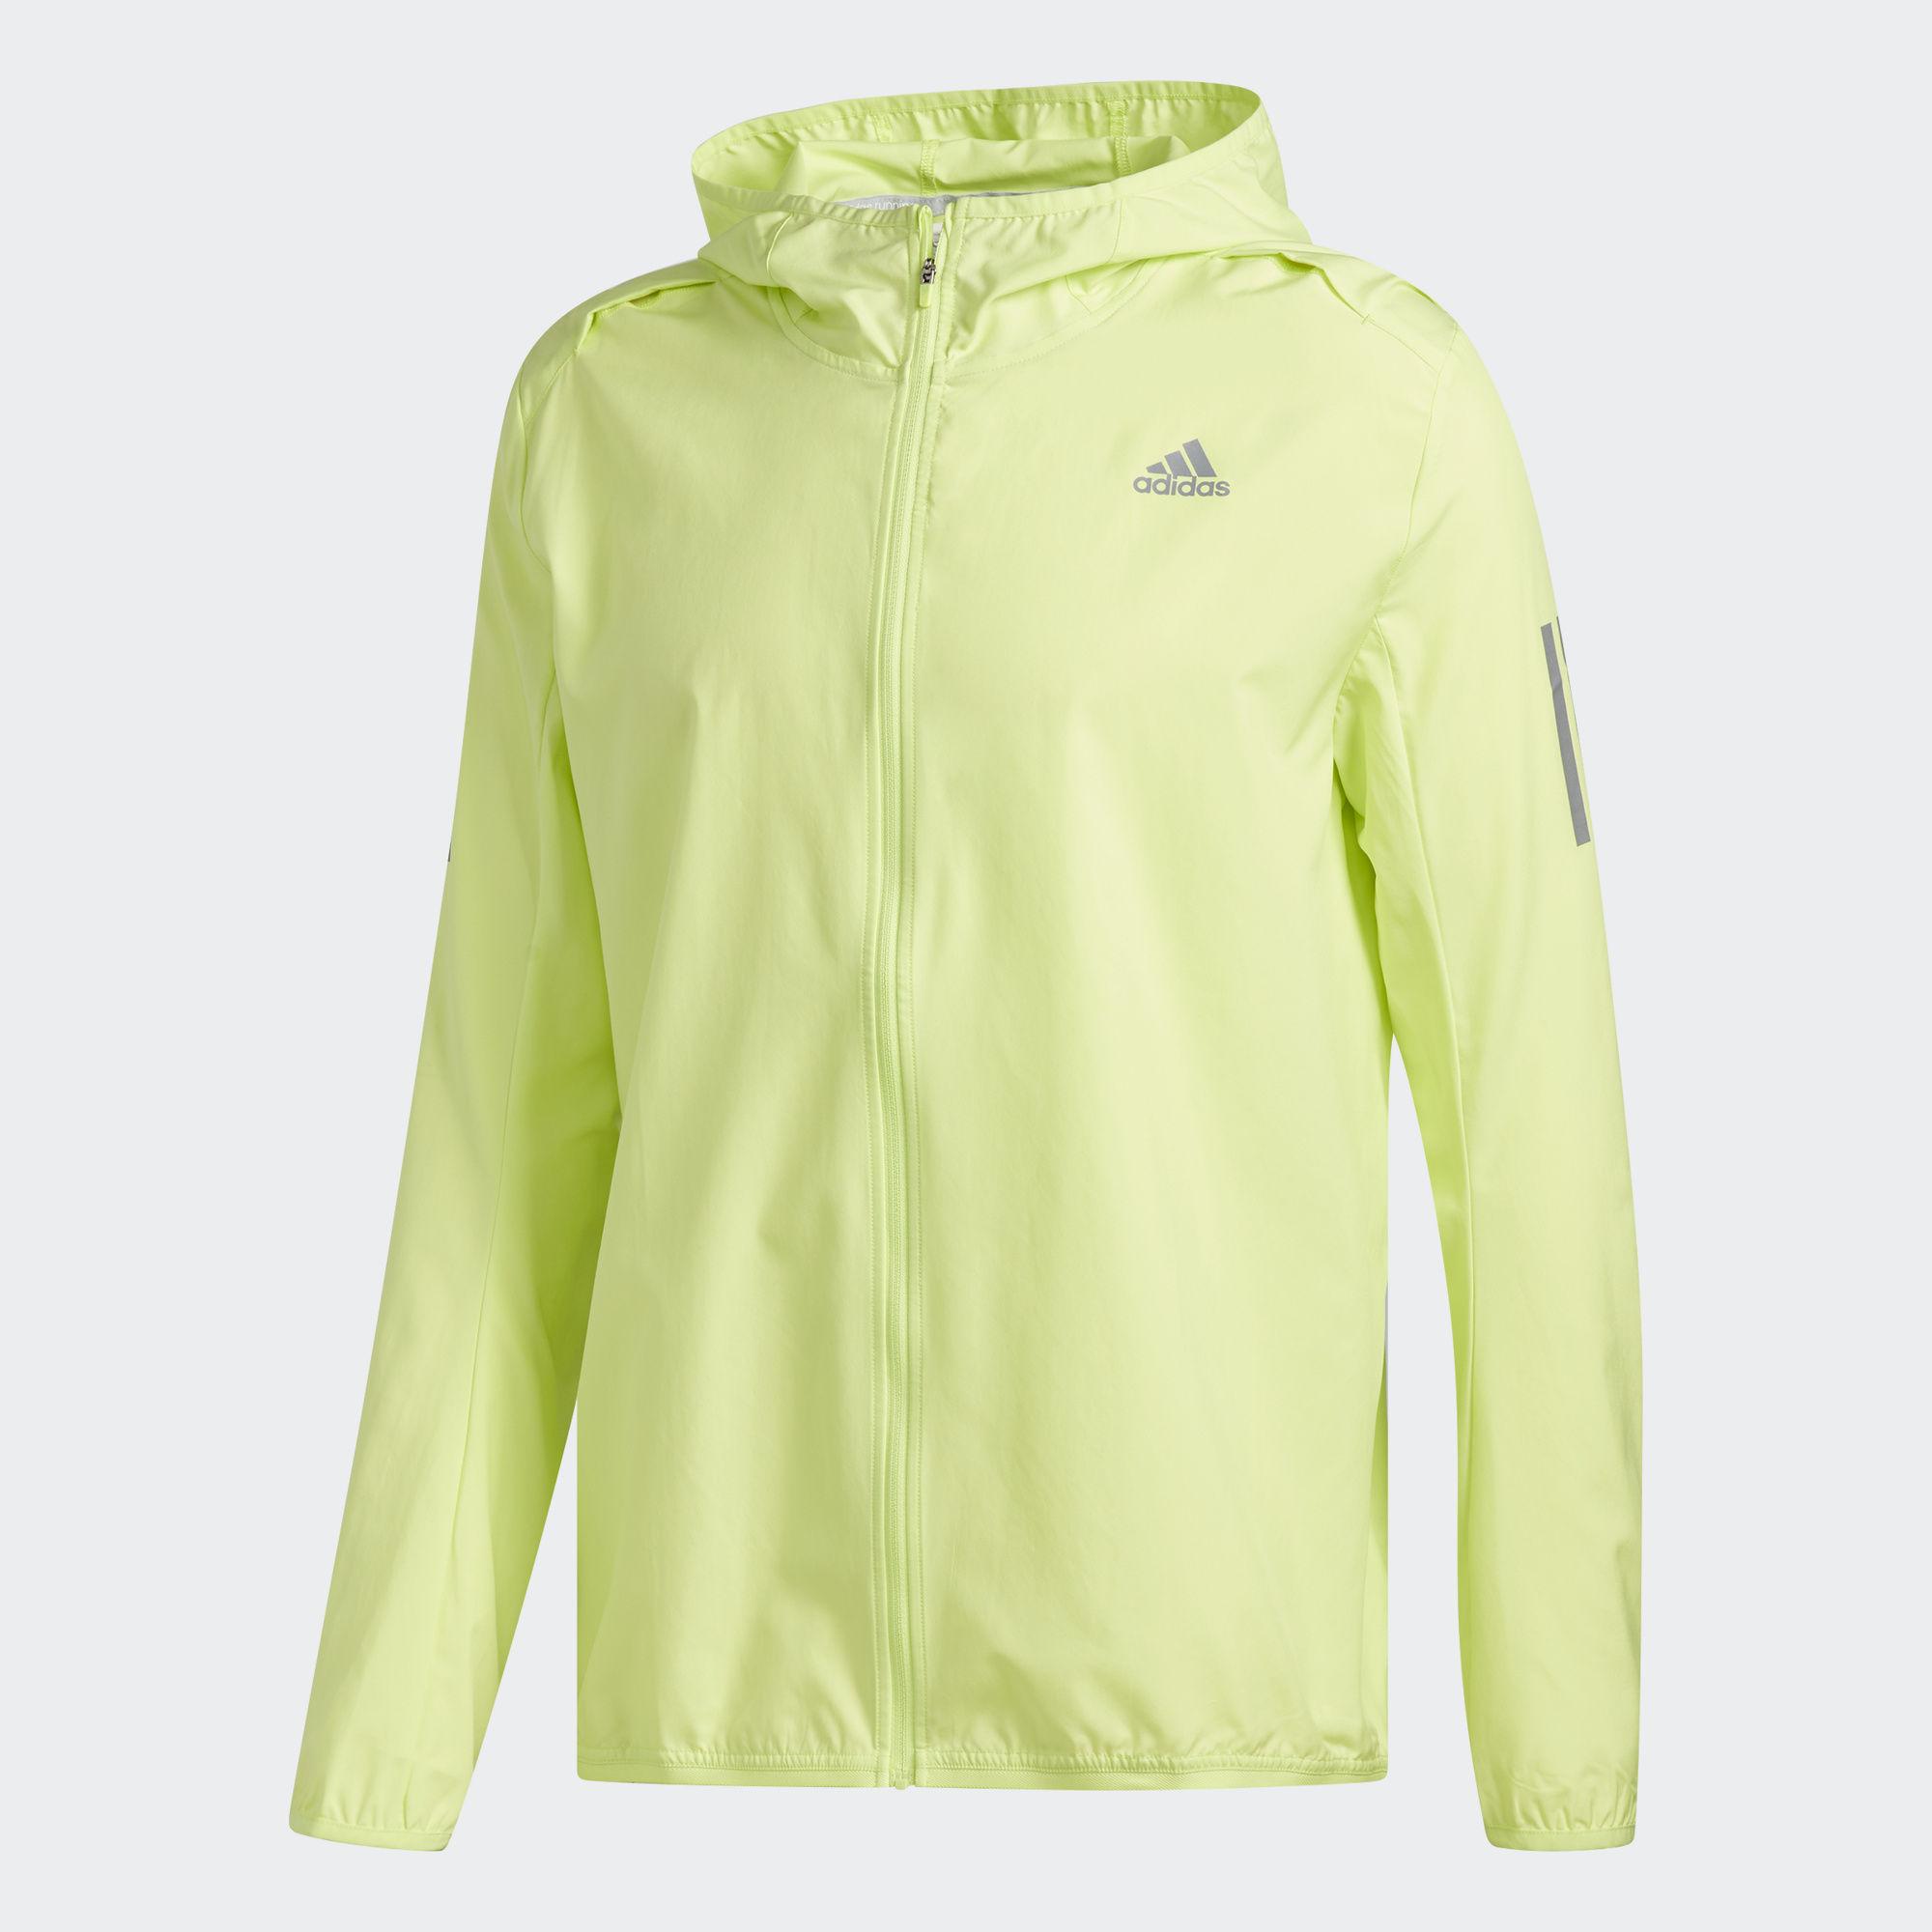 Ветровка мужская Adidas Rs Hd Wnd Jkt M, цвет: желтый. CF2094. Размер L (52/54)CF2094